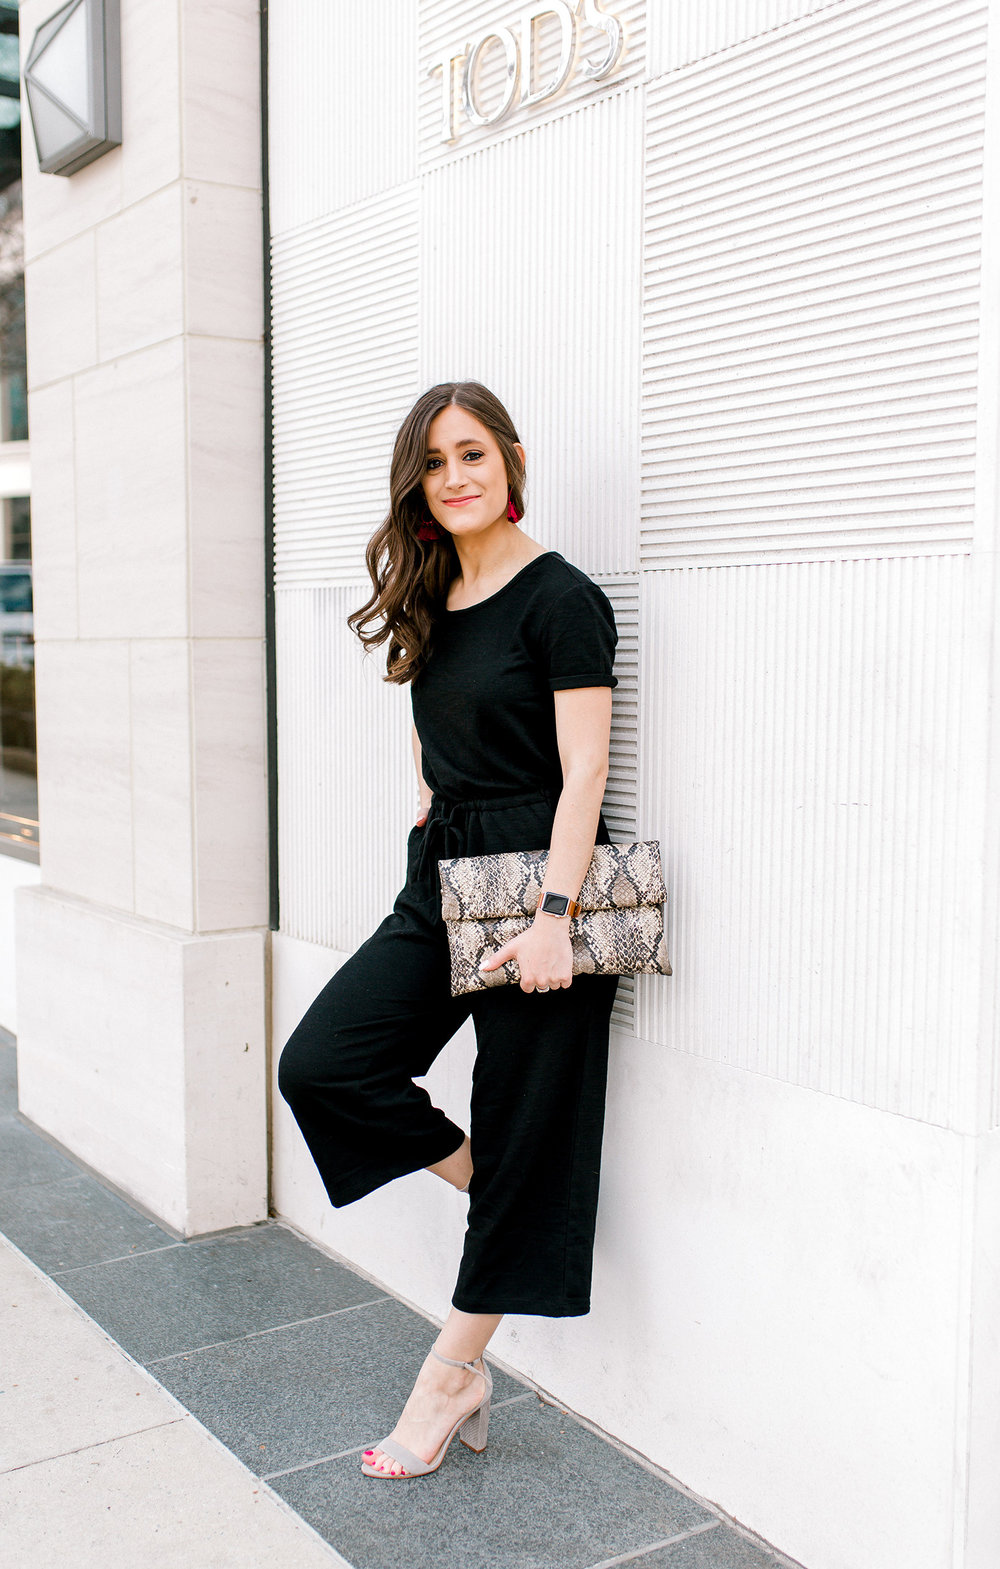 Meet Madison, blogger behind @friedfashions